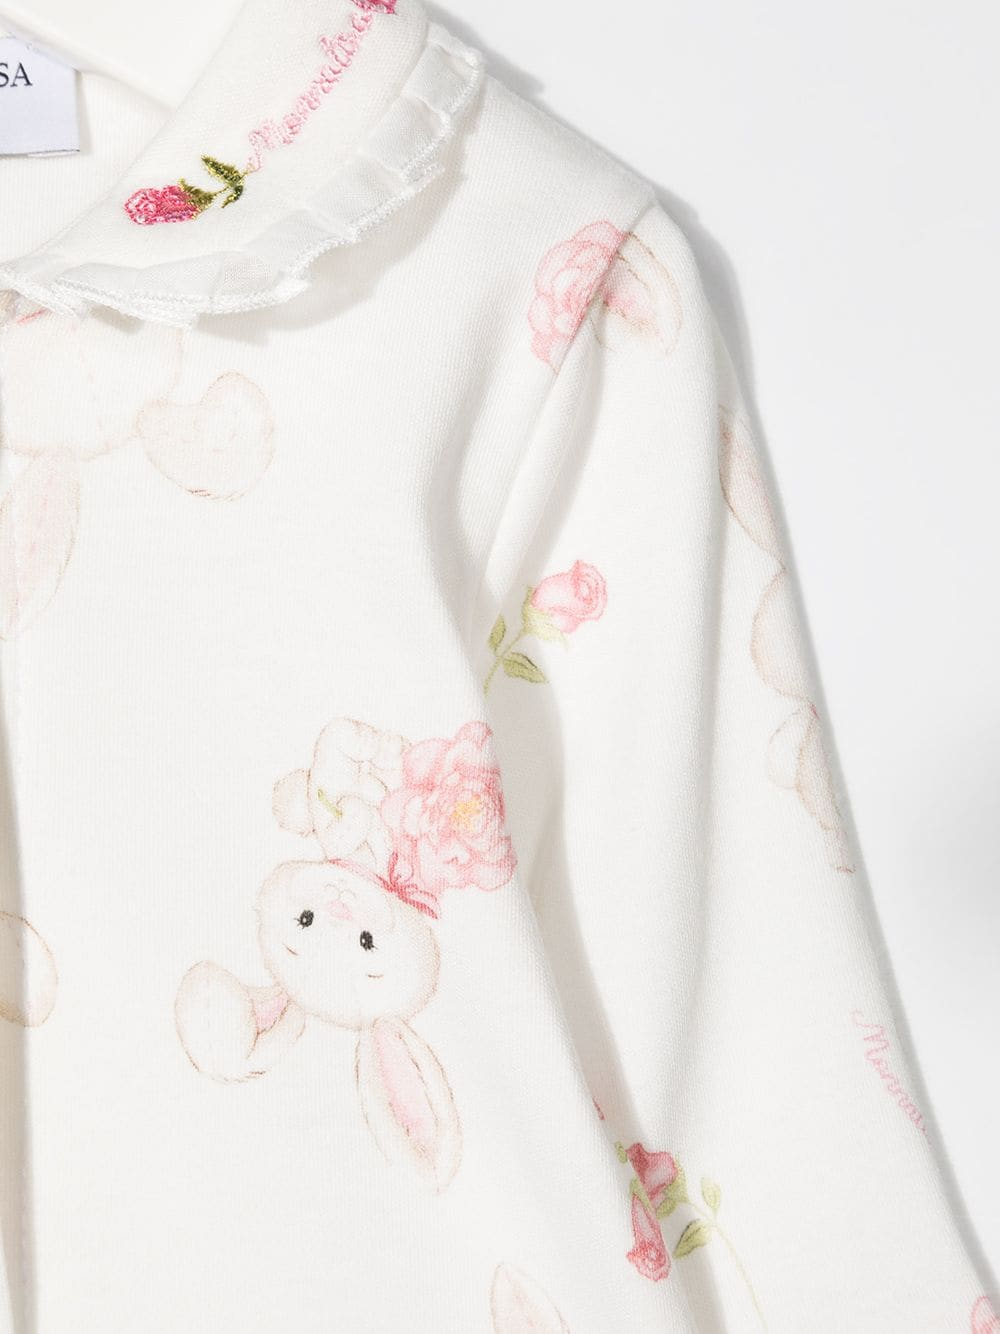 tutina monnalisaromantic rose  in cotone interlock con stampa bocciolini MONNALISA BEBE | Tutina | 35720070090190